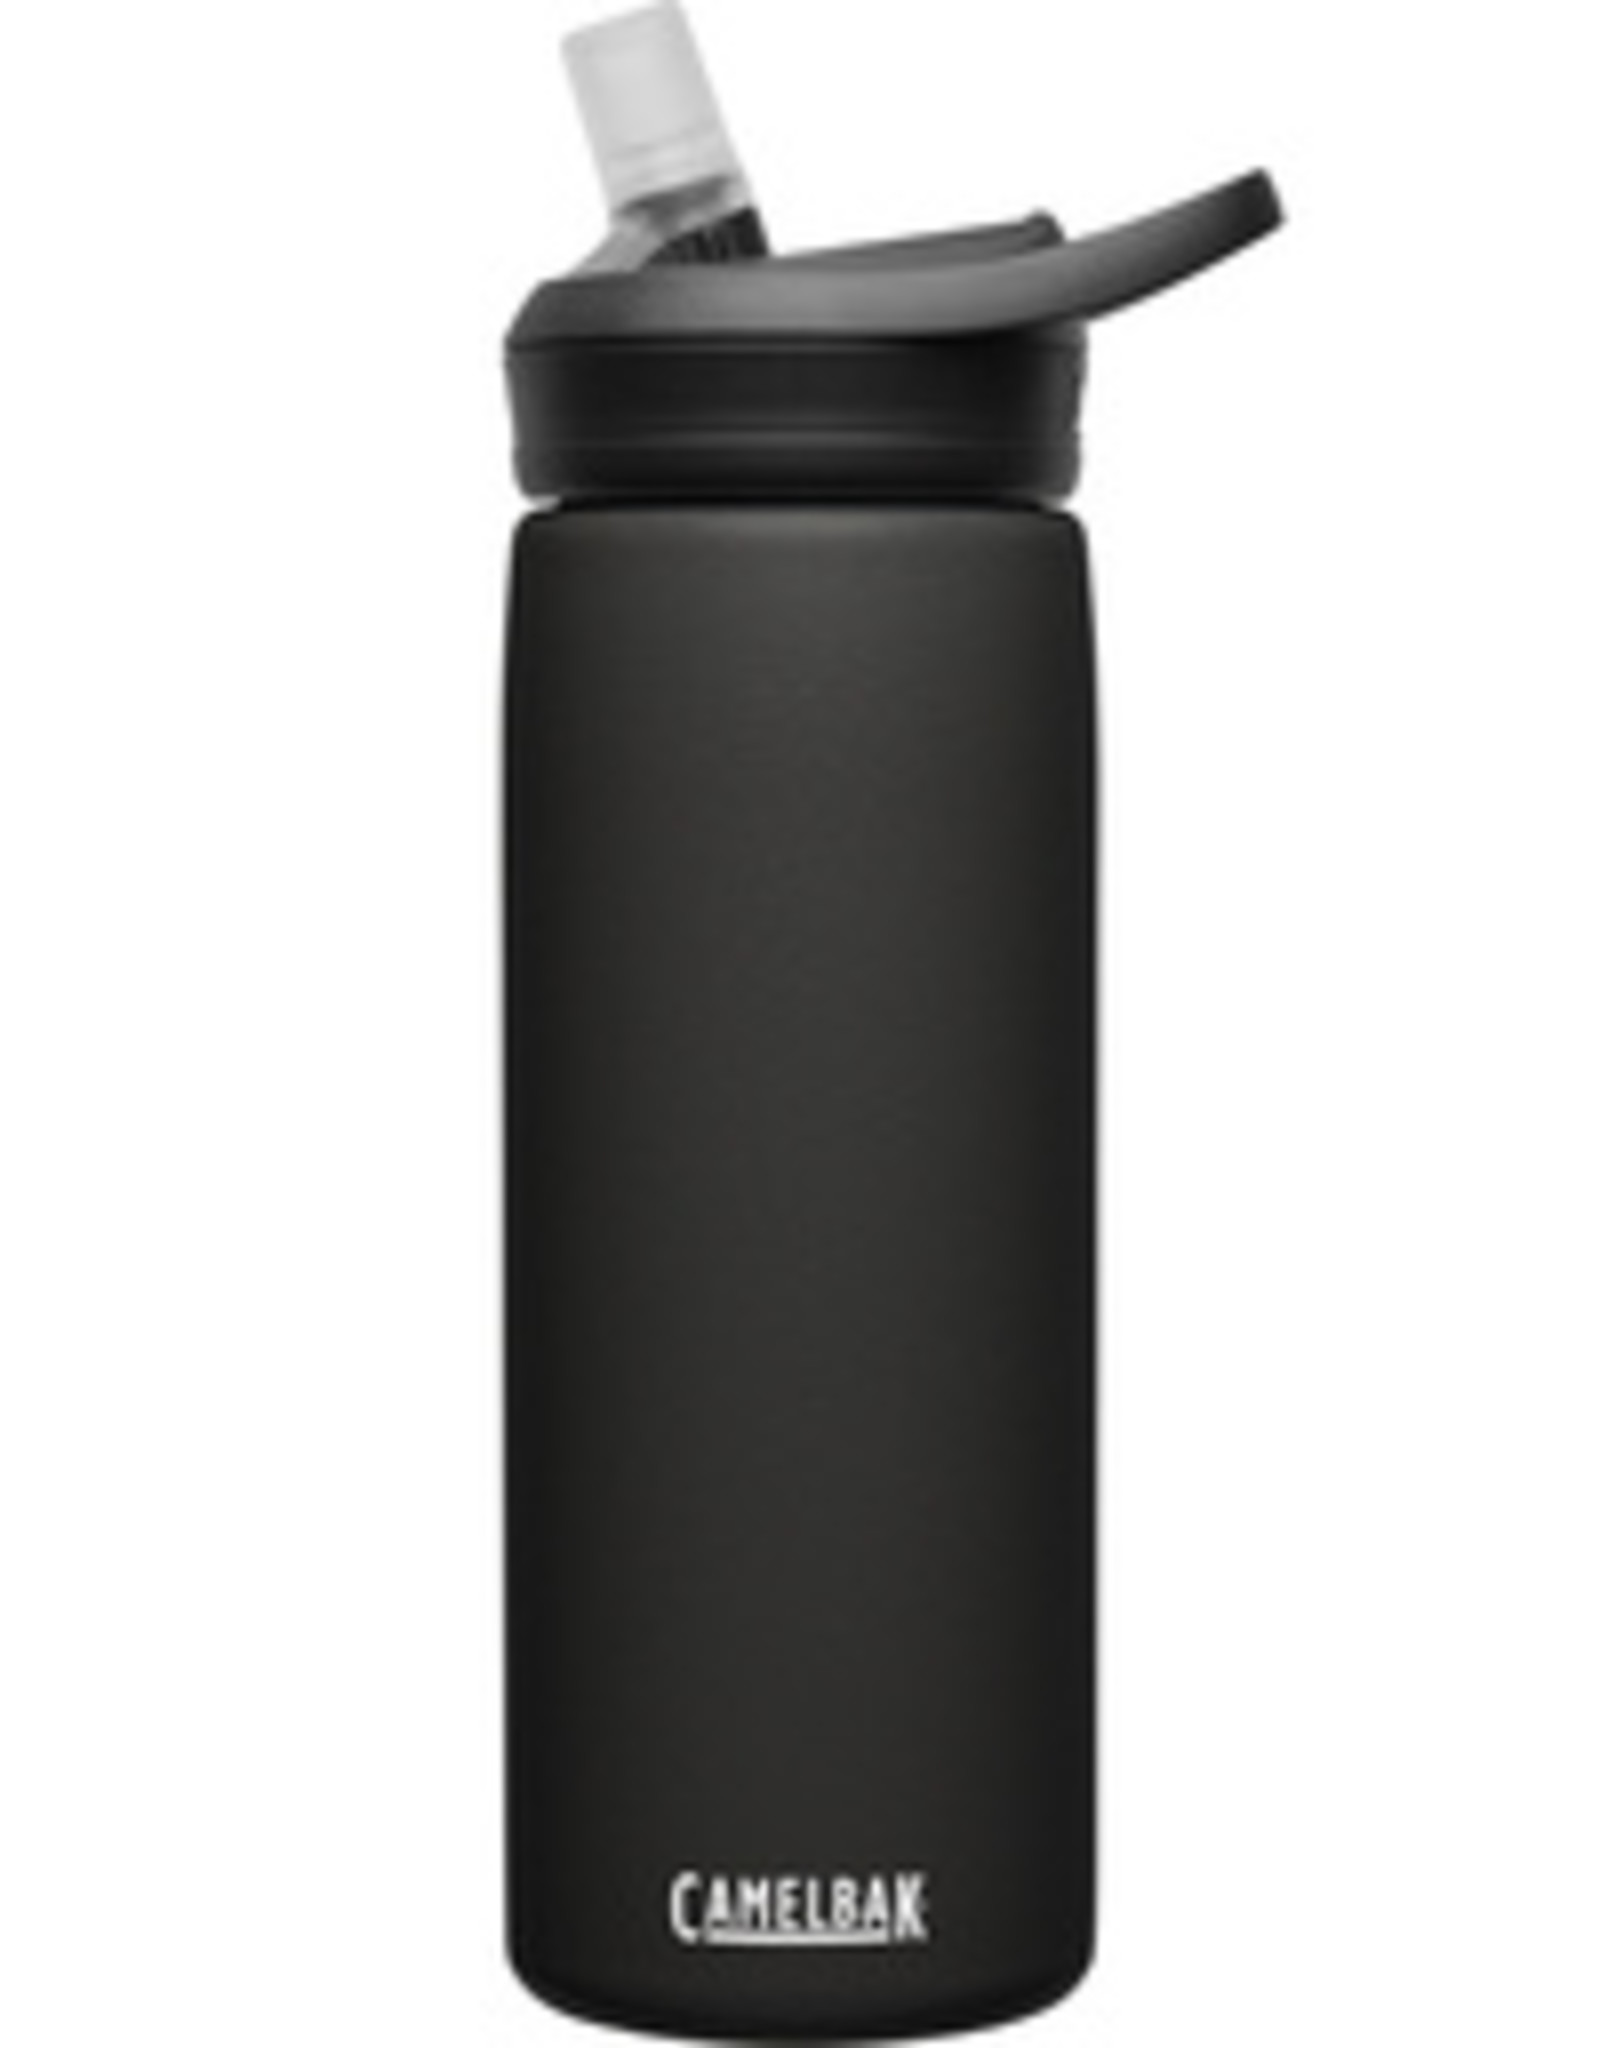 Camelbak Camelbak Eddy+ SST Vacuum Insulated 20oz